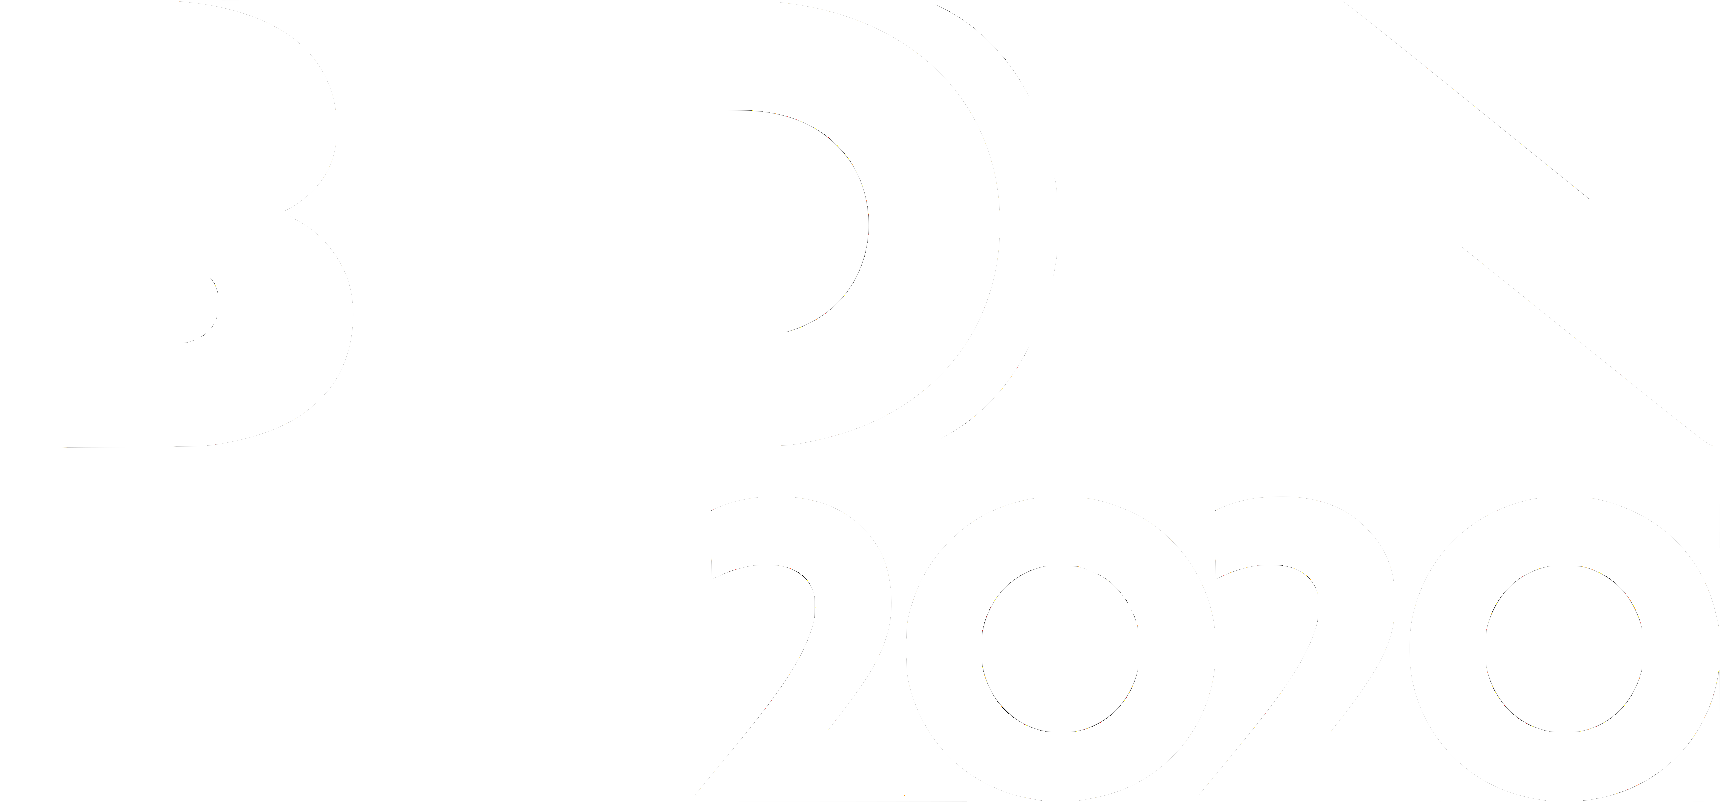 Vice President Joe Biden, endorsement, 2020 election, election day, Kamala Harris